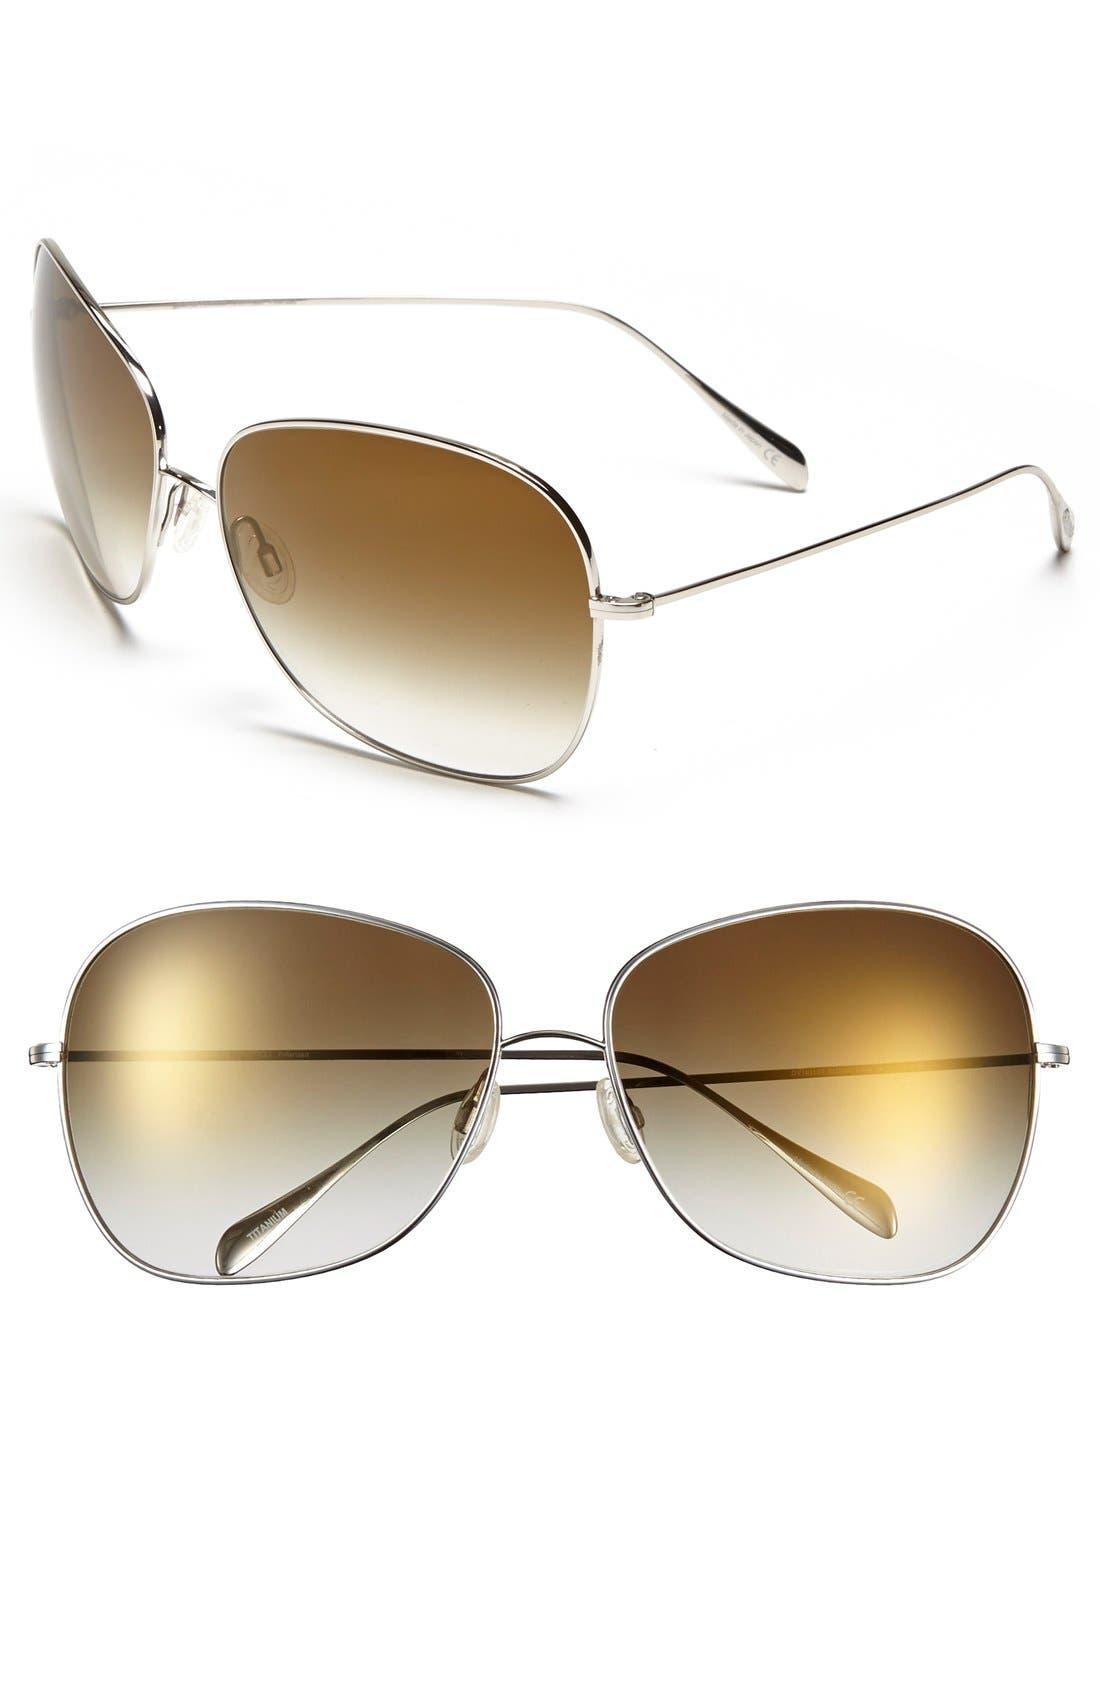 Elsie 64mm Oversize Metal Sunglasses,                         Main,                         color, Silver/ Bronze Flash Mirror